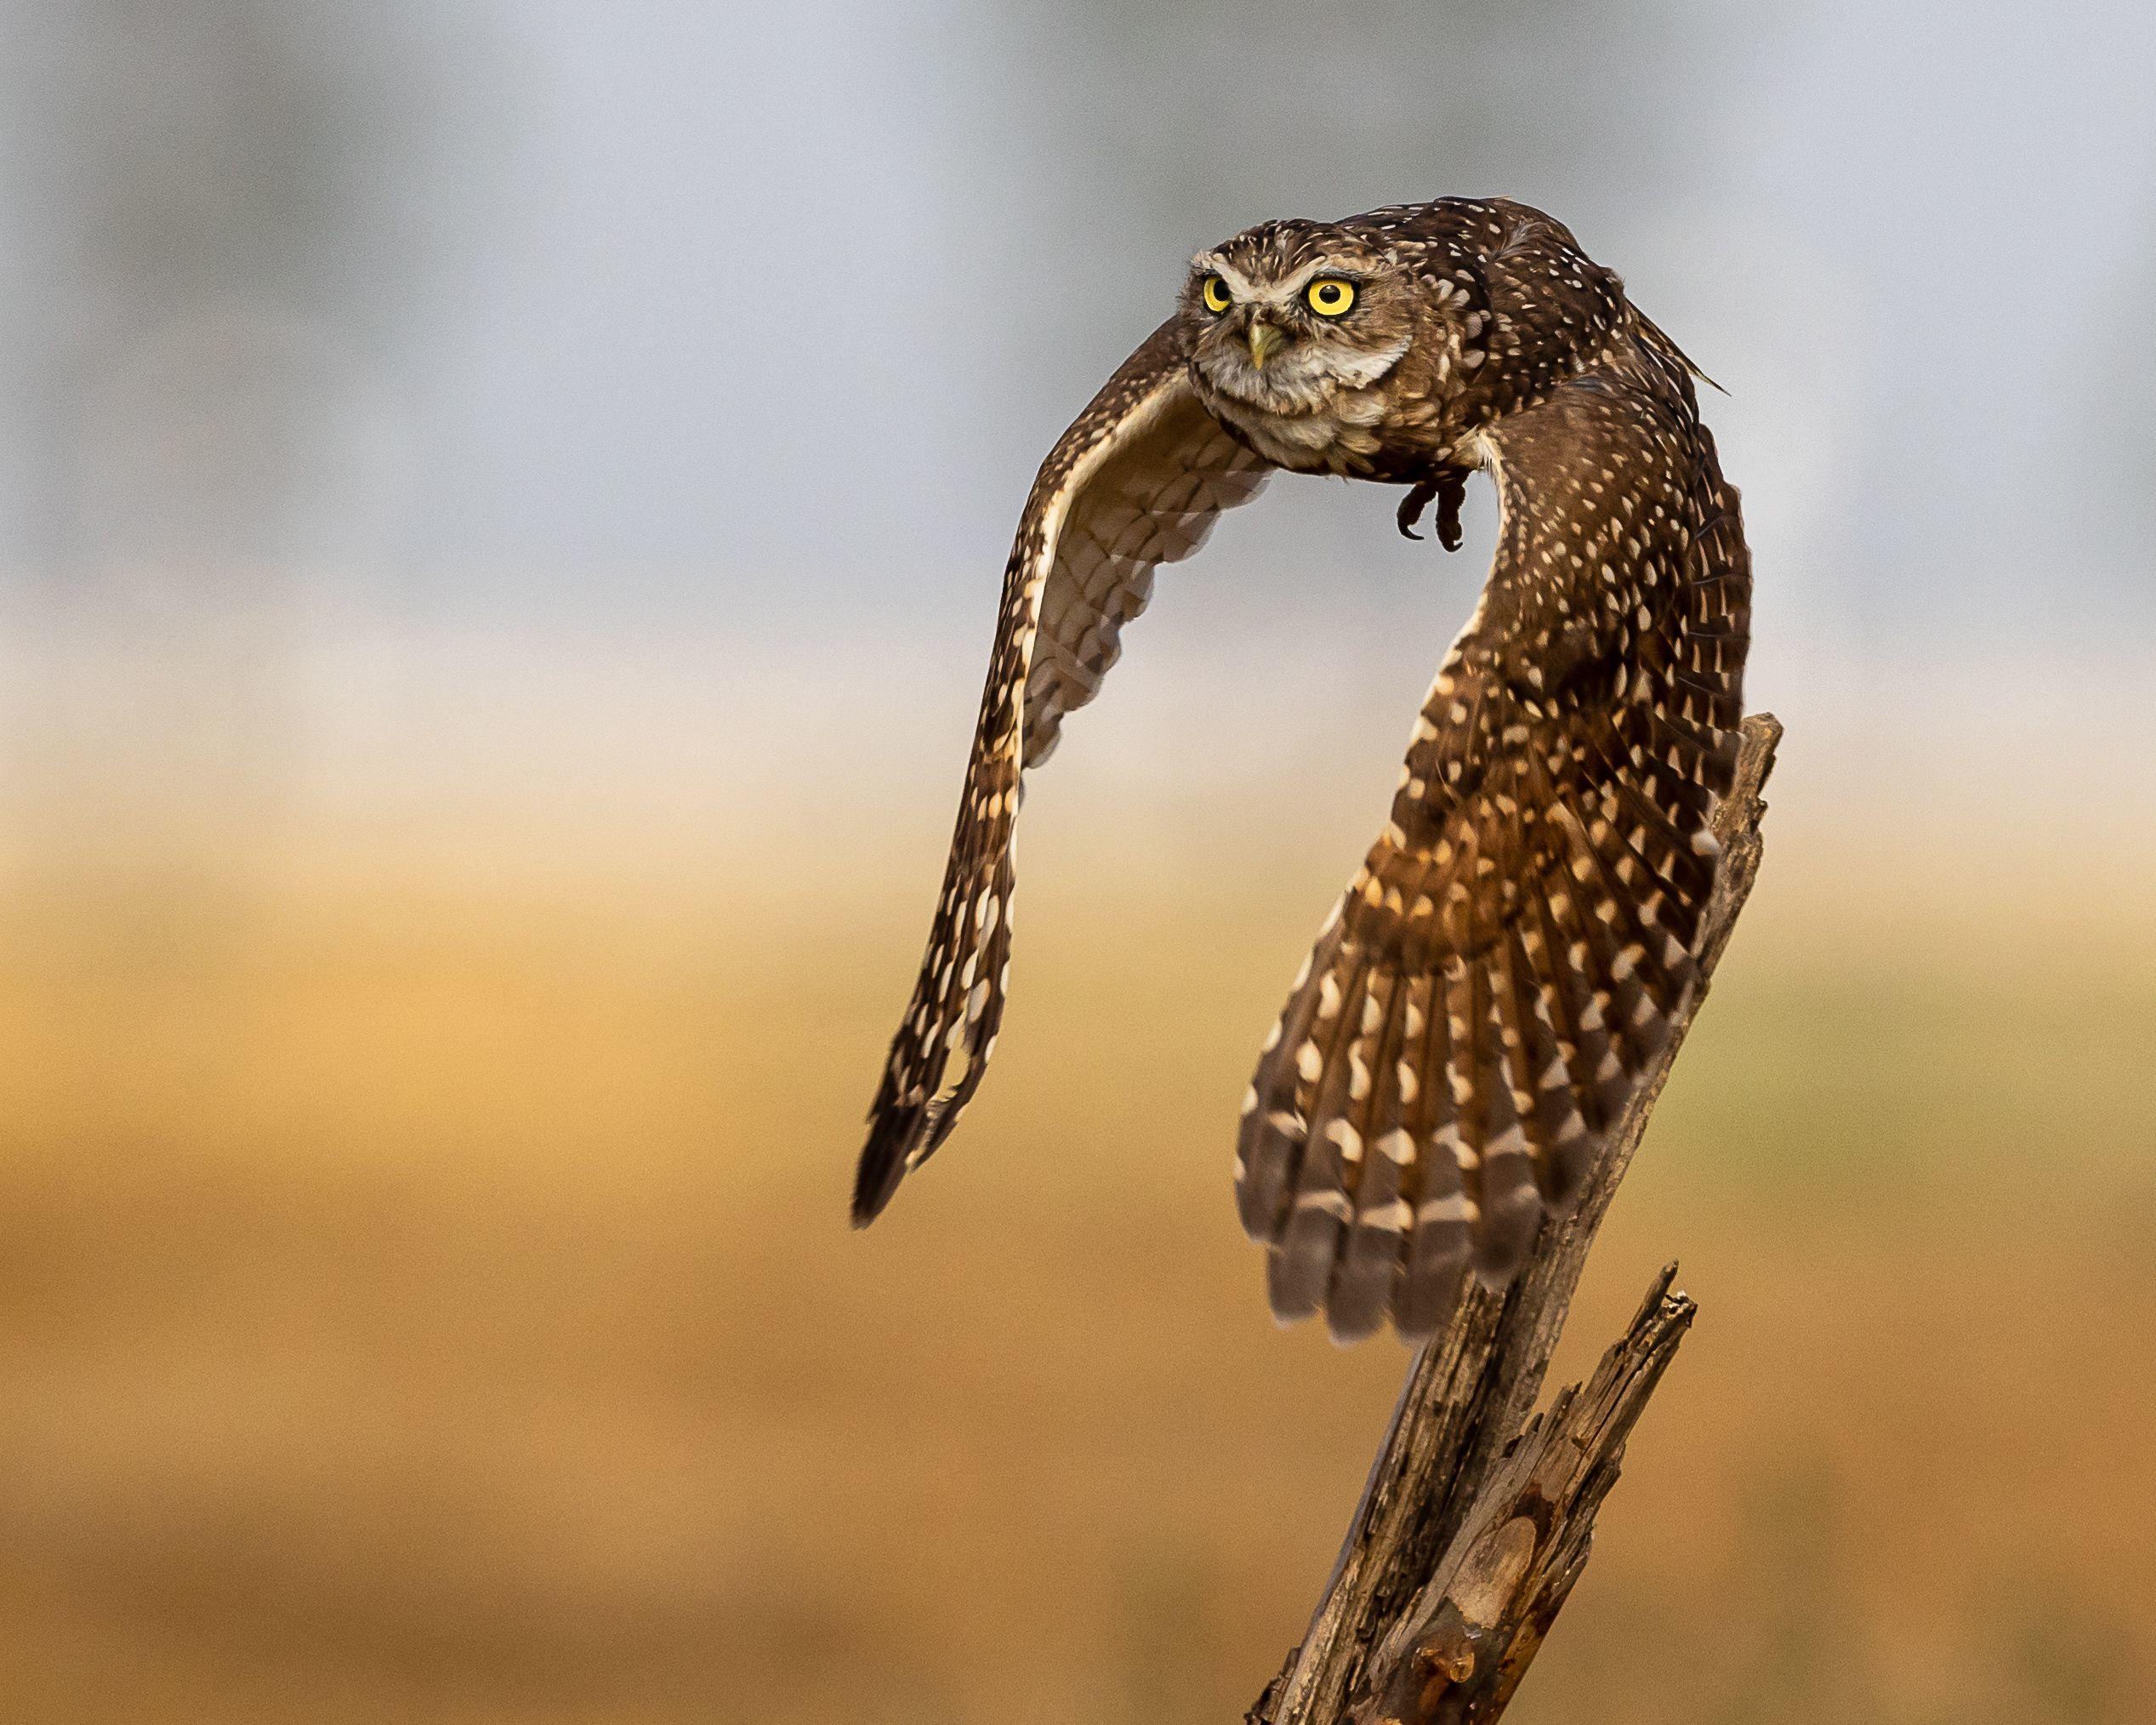 Burrowing Owl by Tammy Kokjohn.